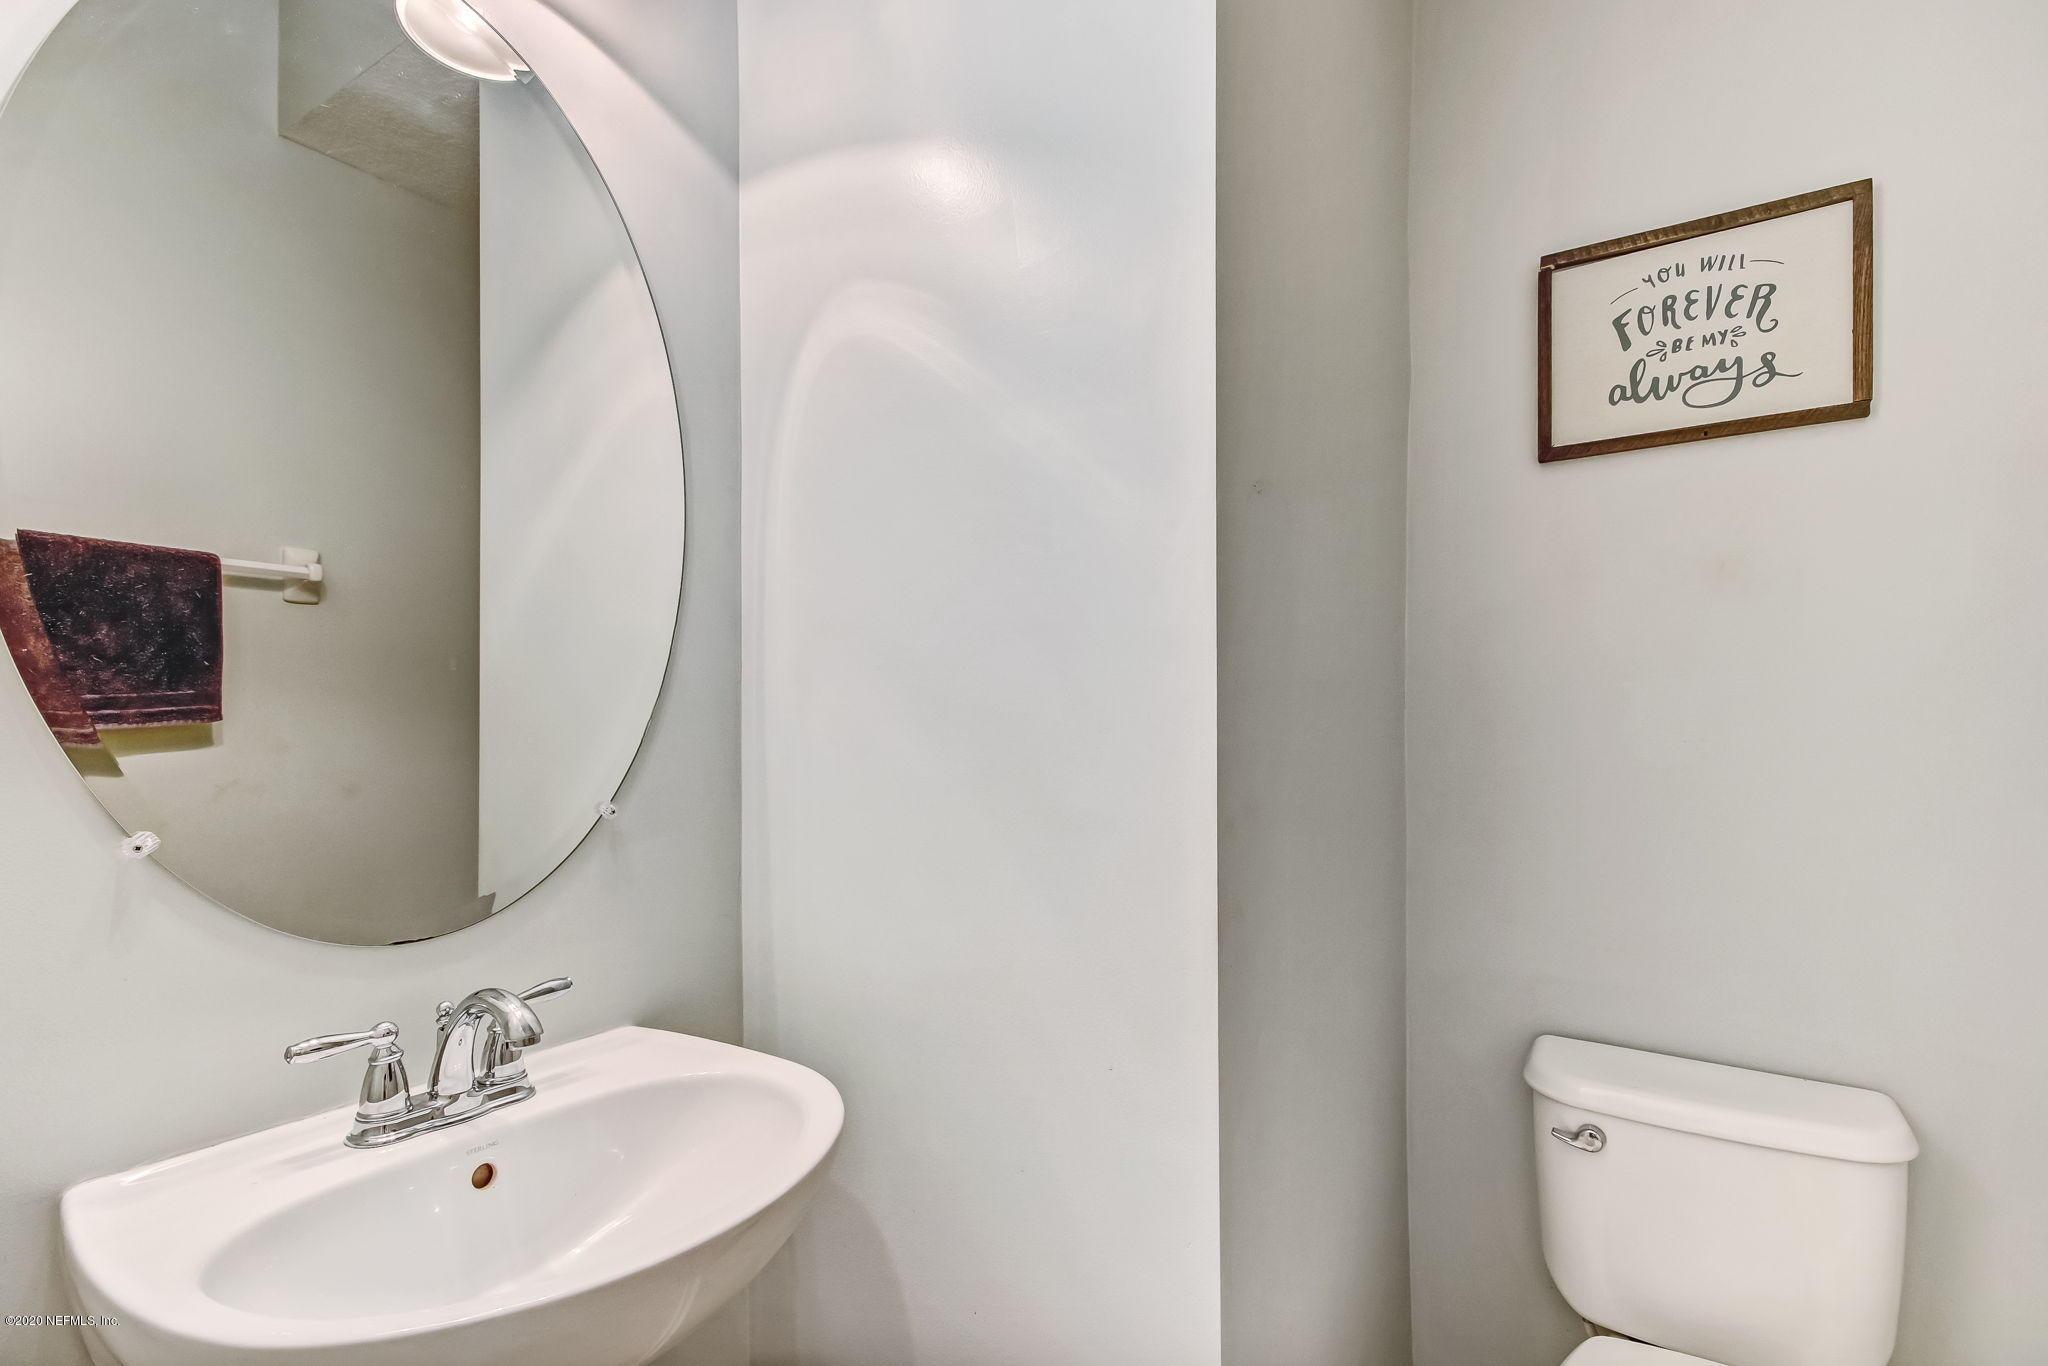 3861 AUBREY, ORANGE PARK, FLORIDA 32065, 3 Bedrooms Bedrooms, ,2 BathroomsBathrooms,Residential,For sale,AUBREY,1081695